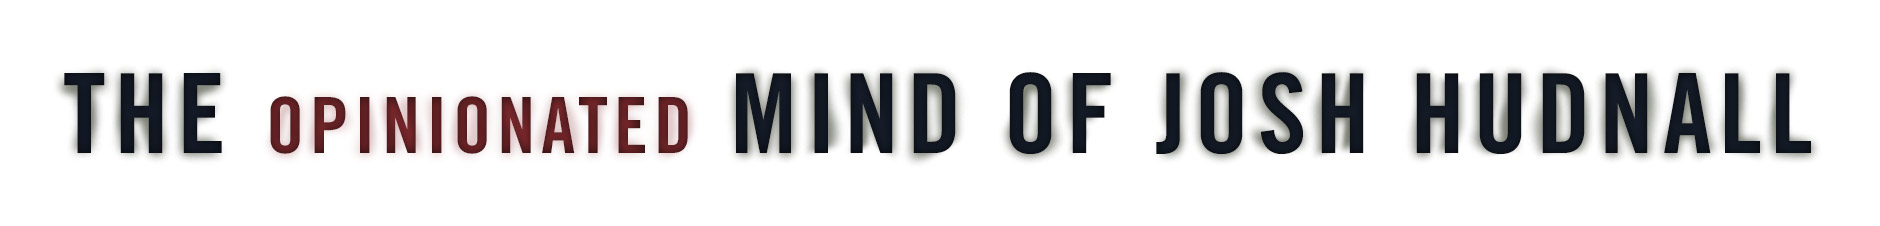 The Opinionated Mind of Josh Hudnall